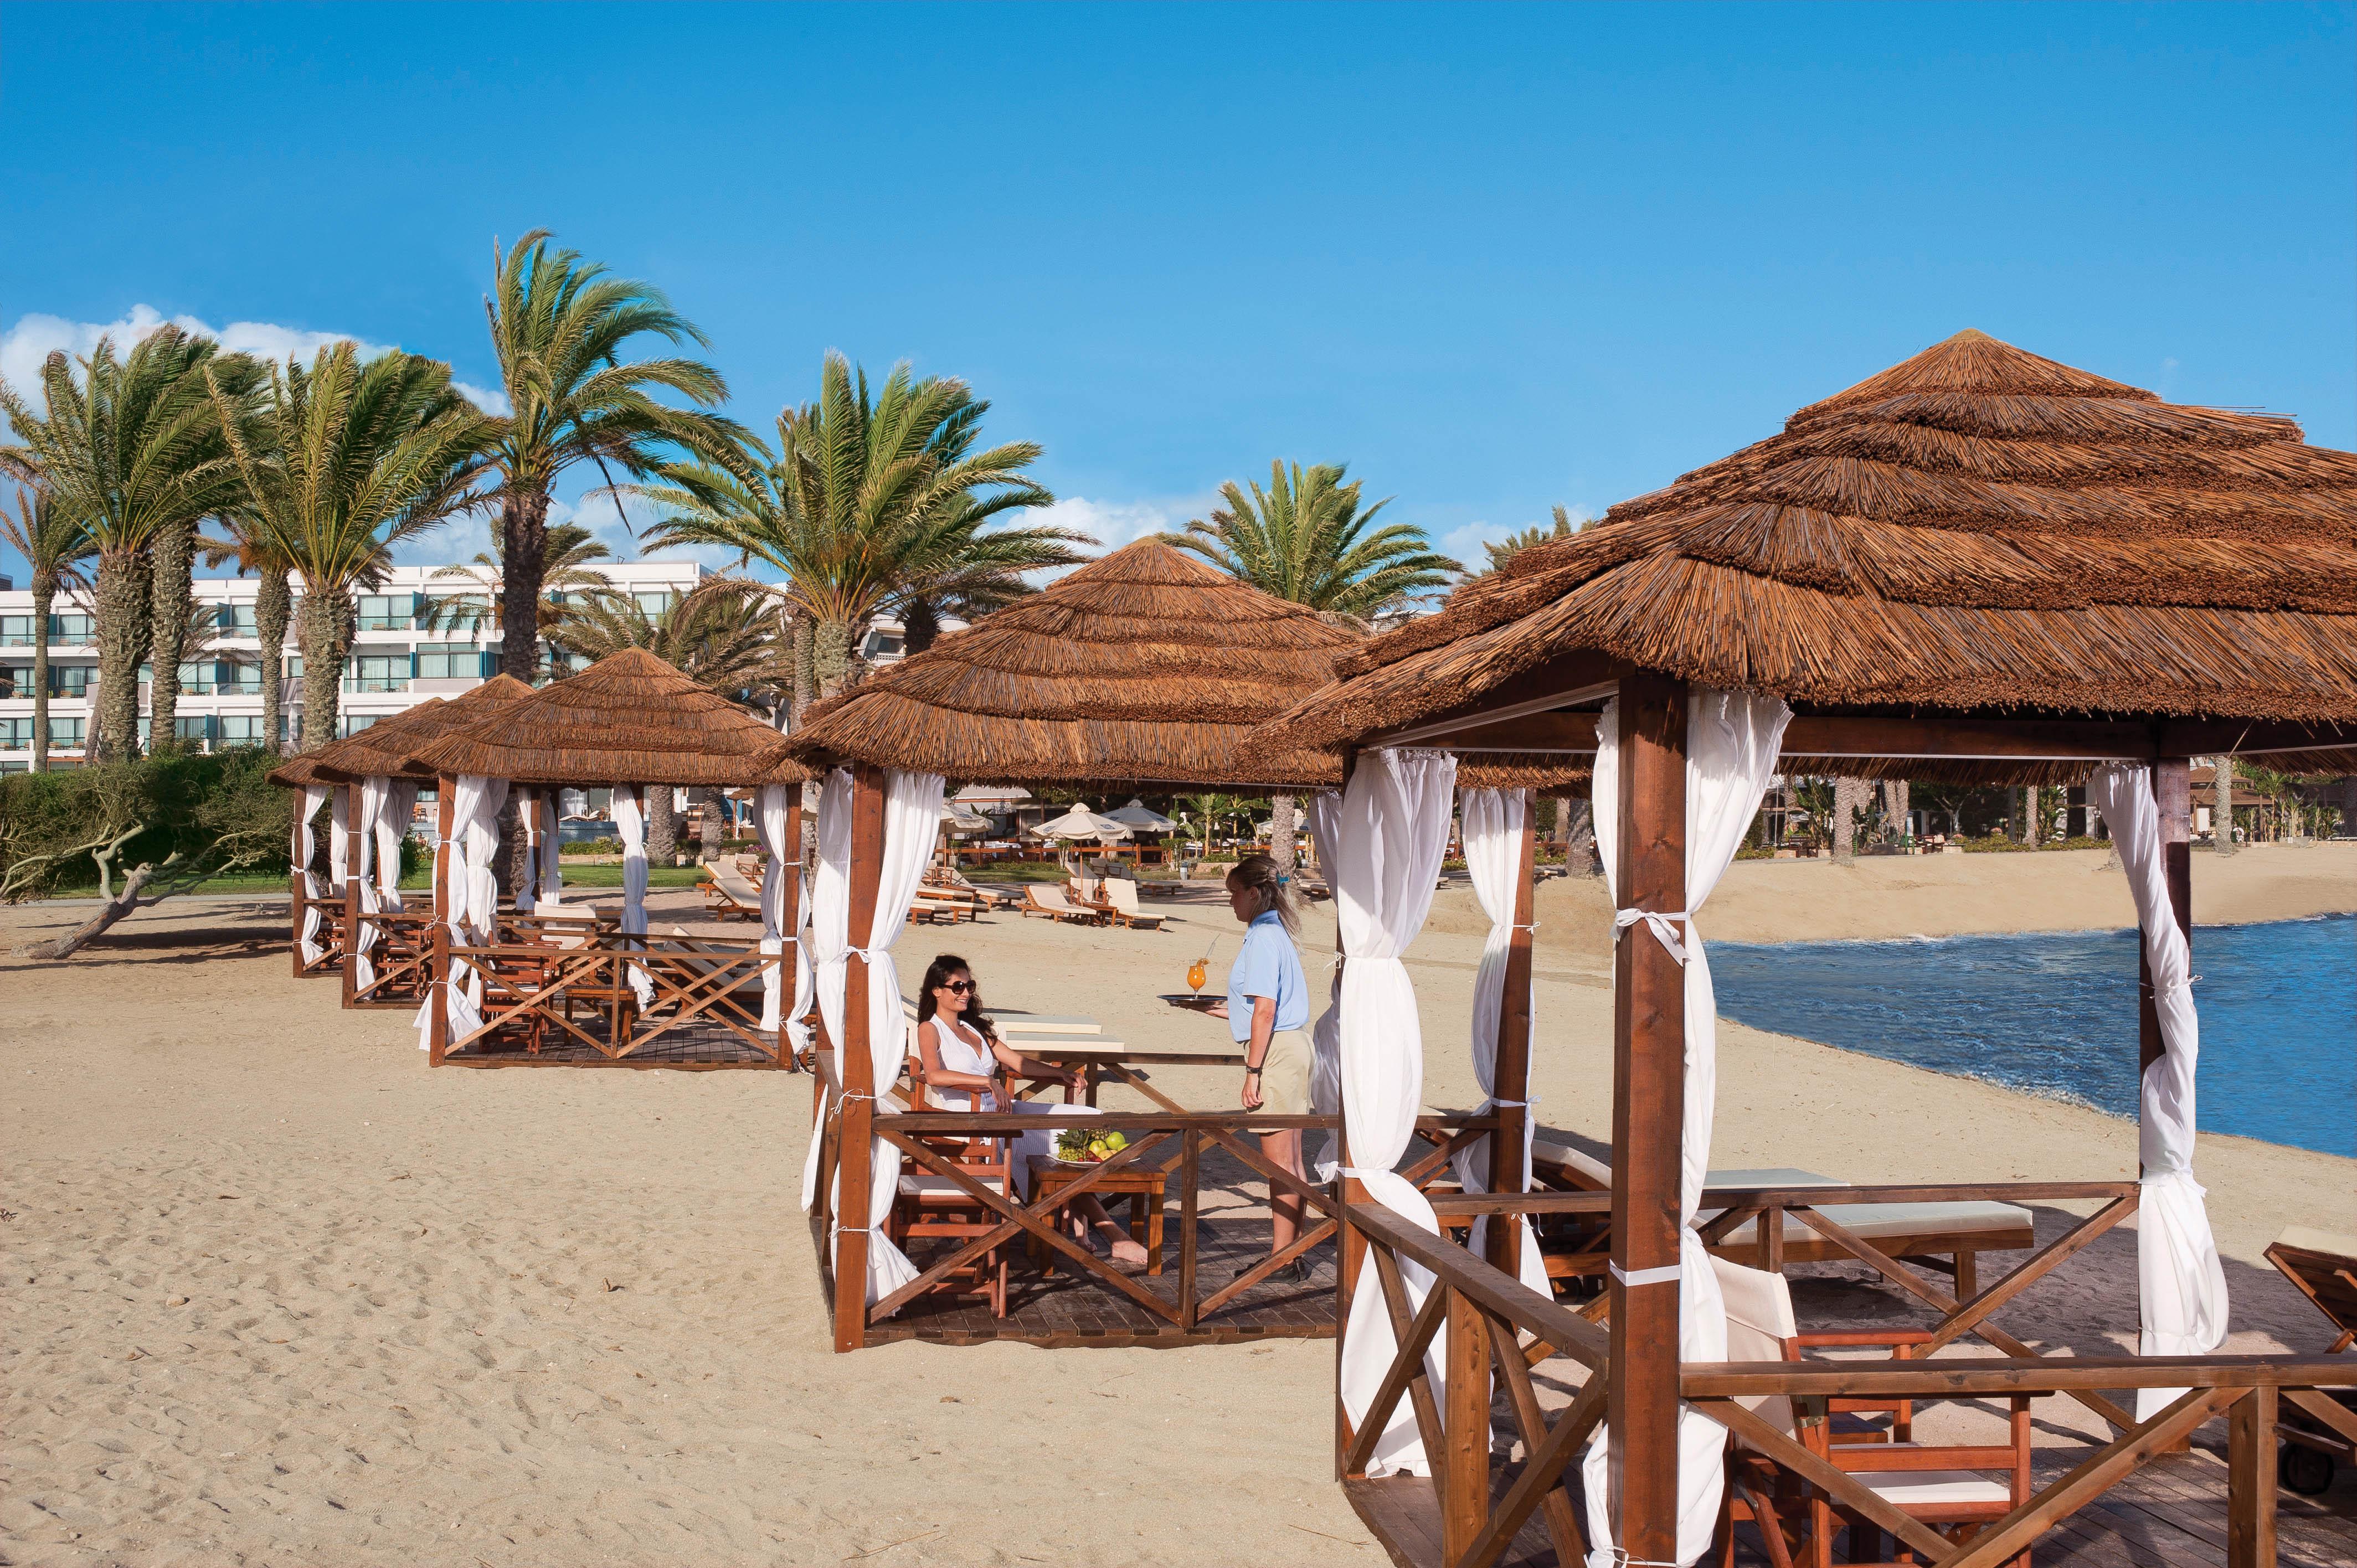 Kipar plaže letovanje mesta hoteli aranžmani Pafos